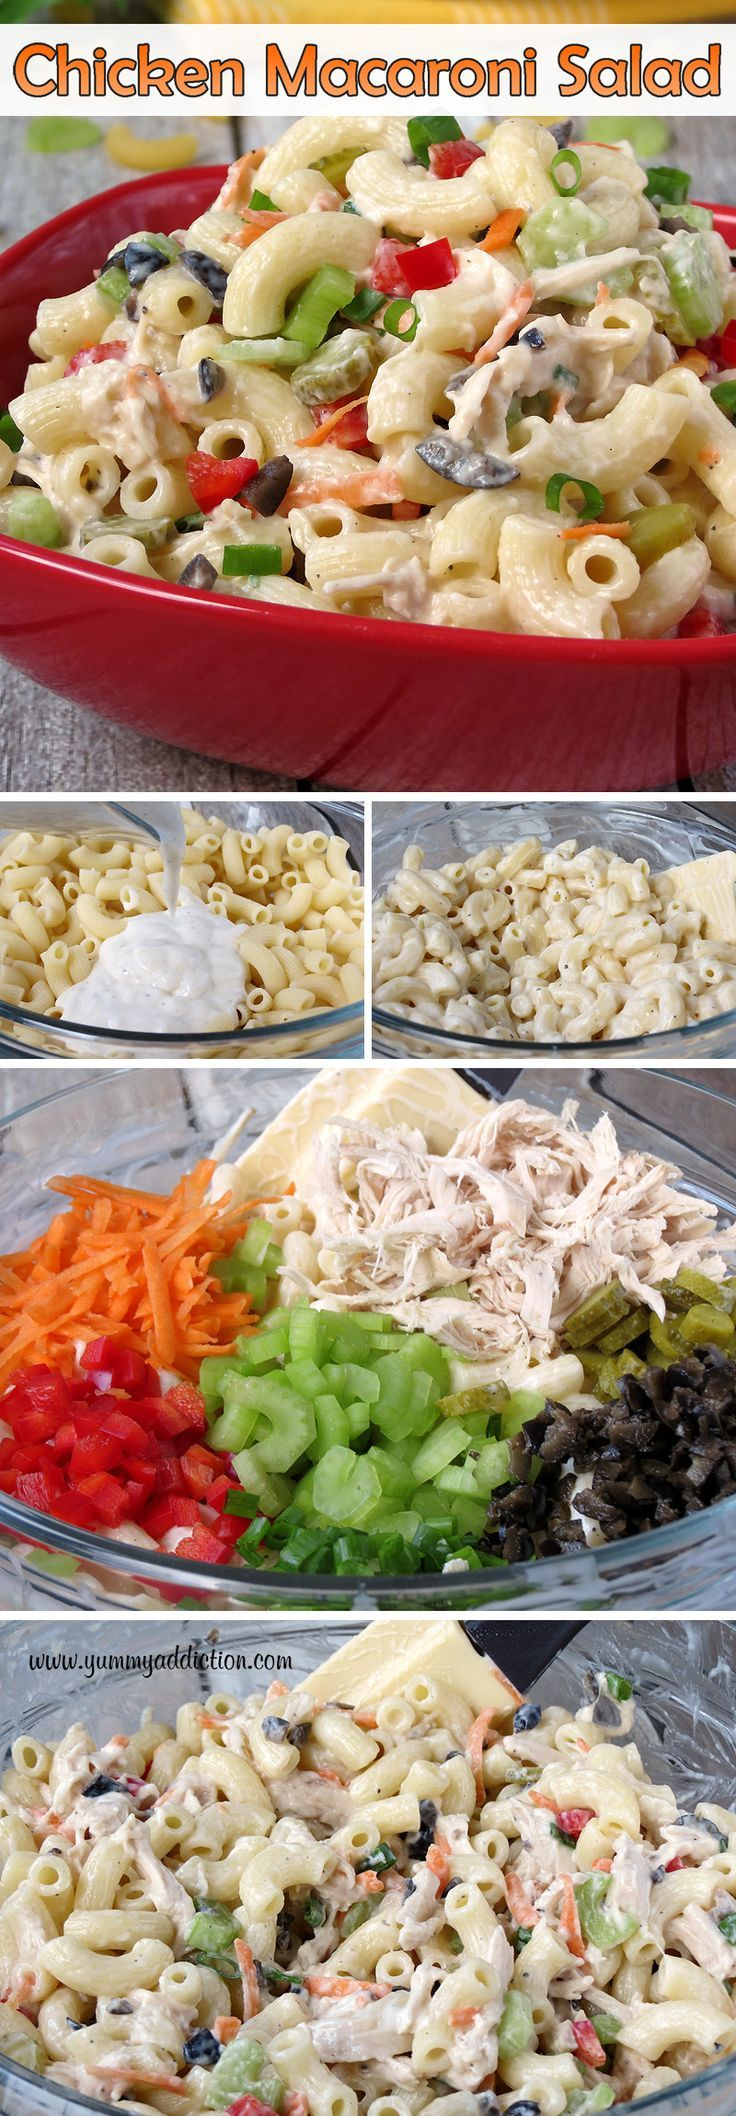 Chicken Macaroni Salad | http://YummyAddiction.com